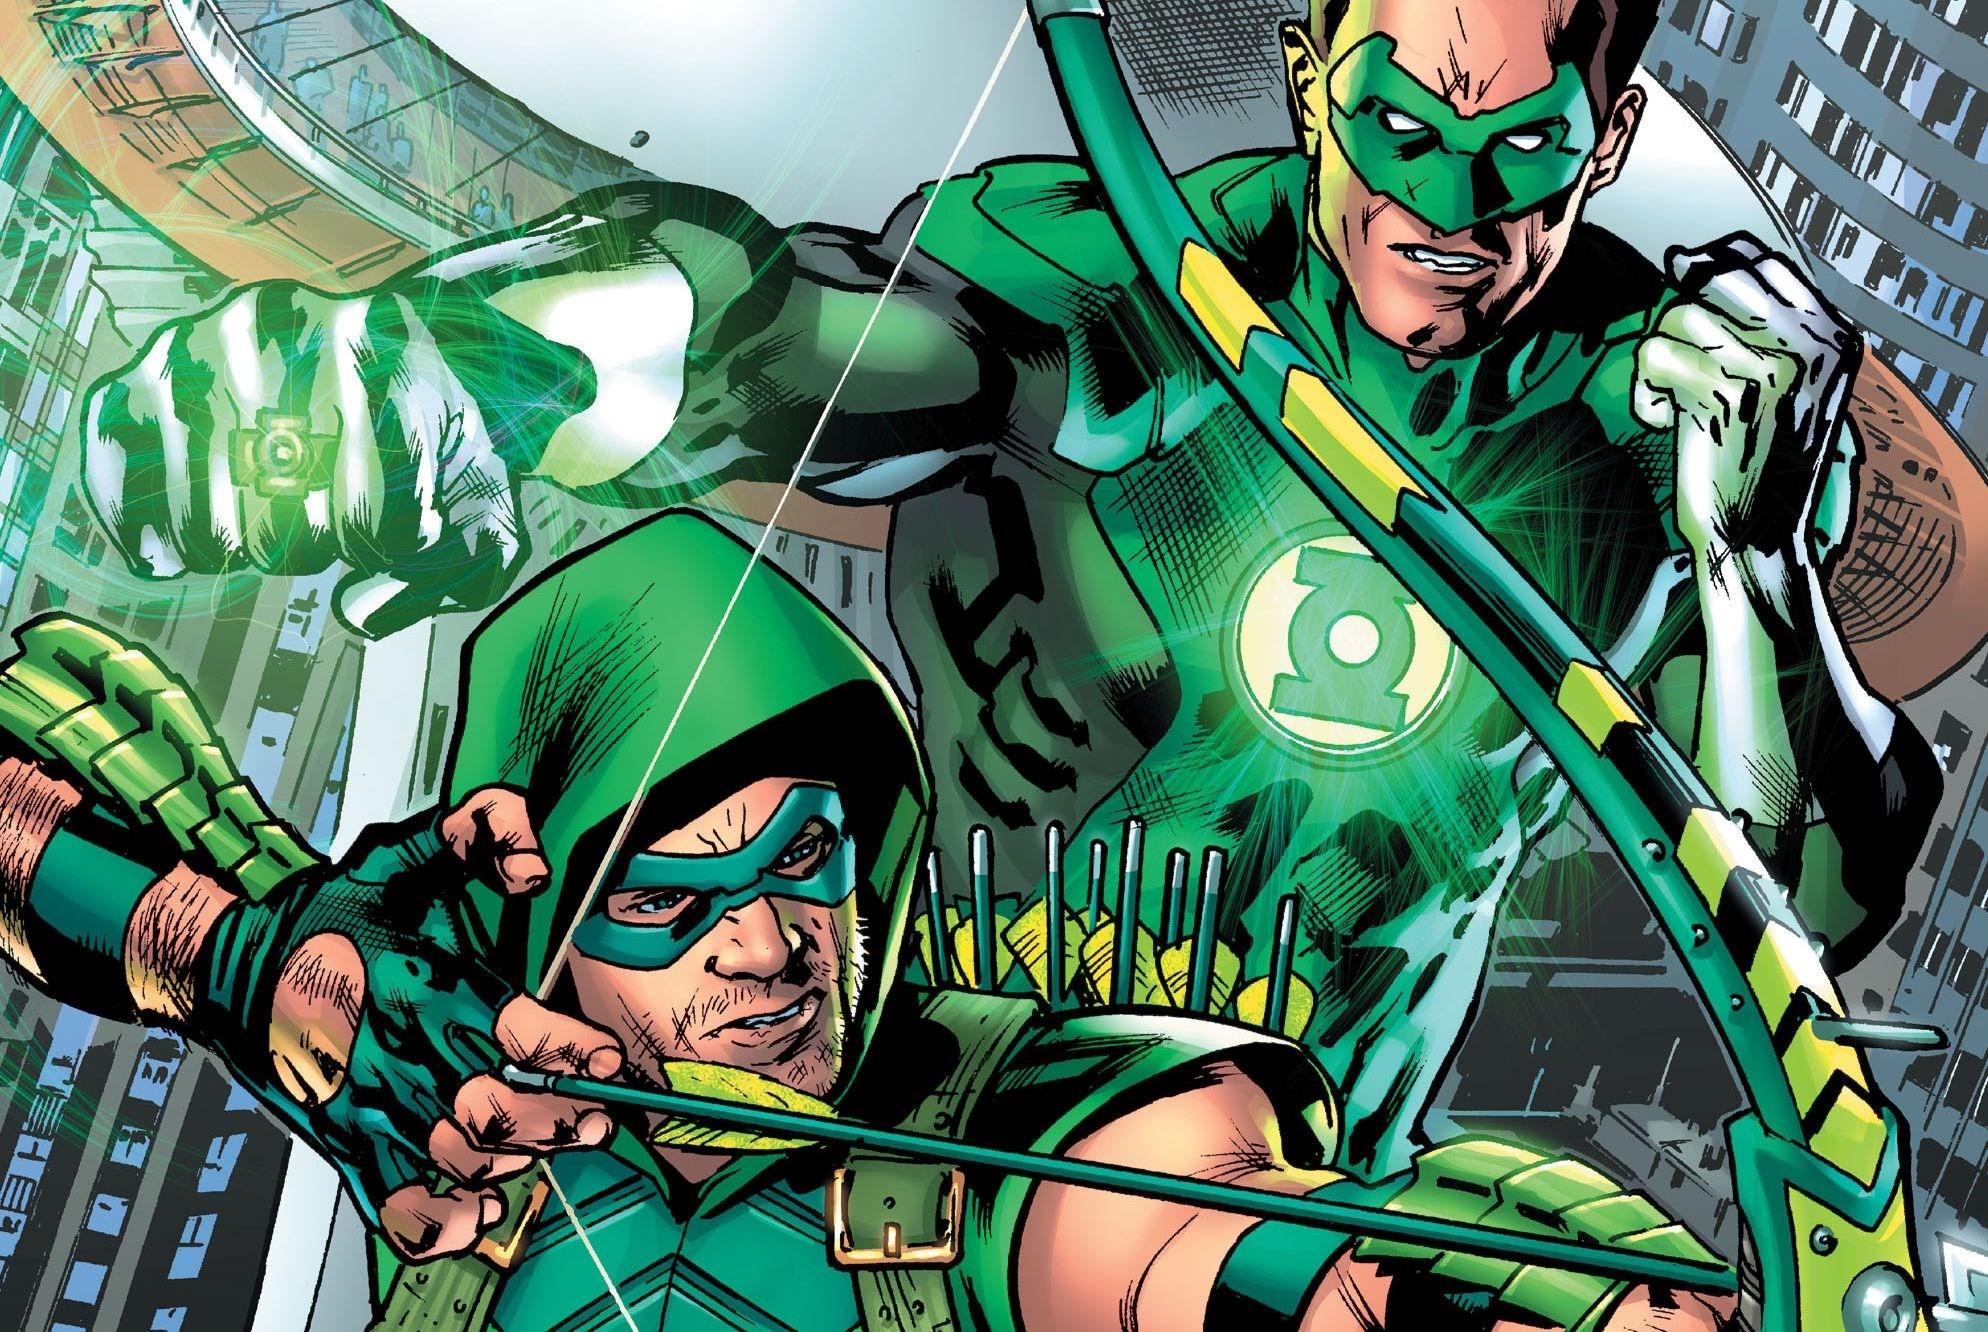 green arrow image – Background hd – green arrow category